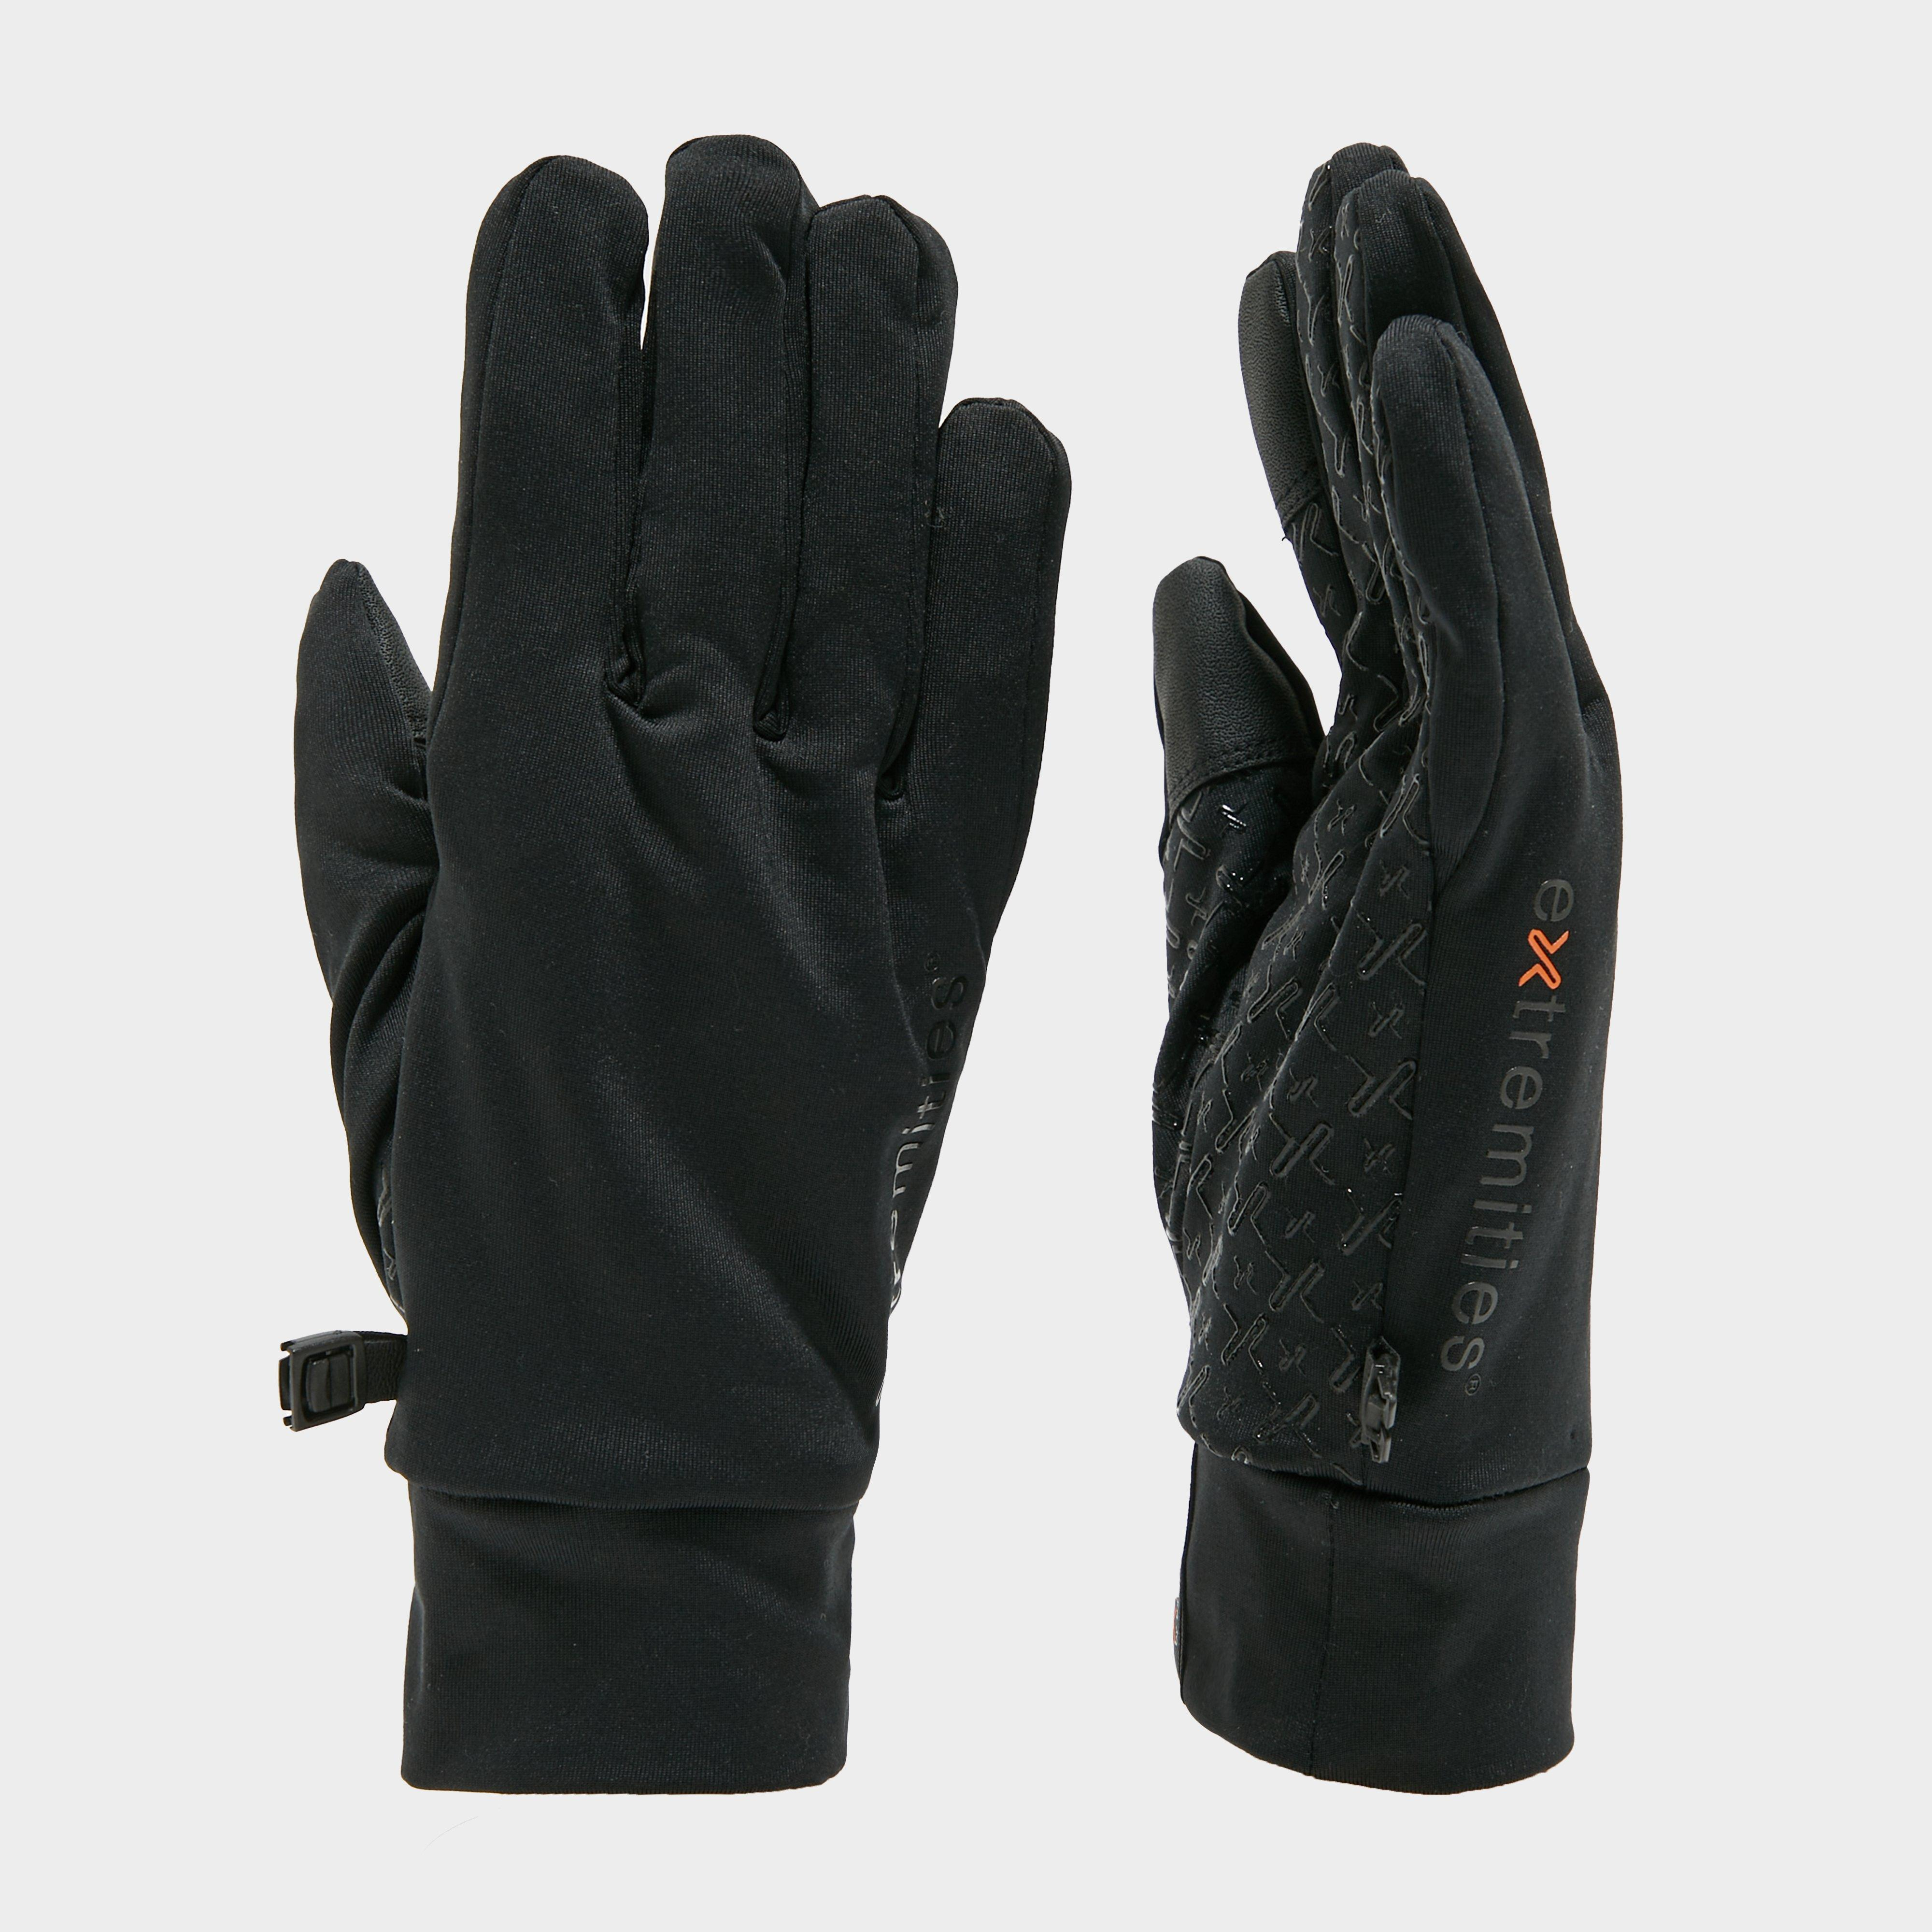 Extremities Waterproof Sticky Power Liner Glove - Black, Black